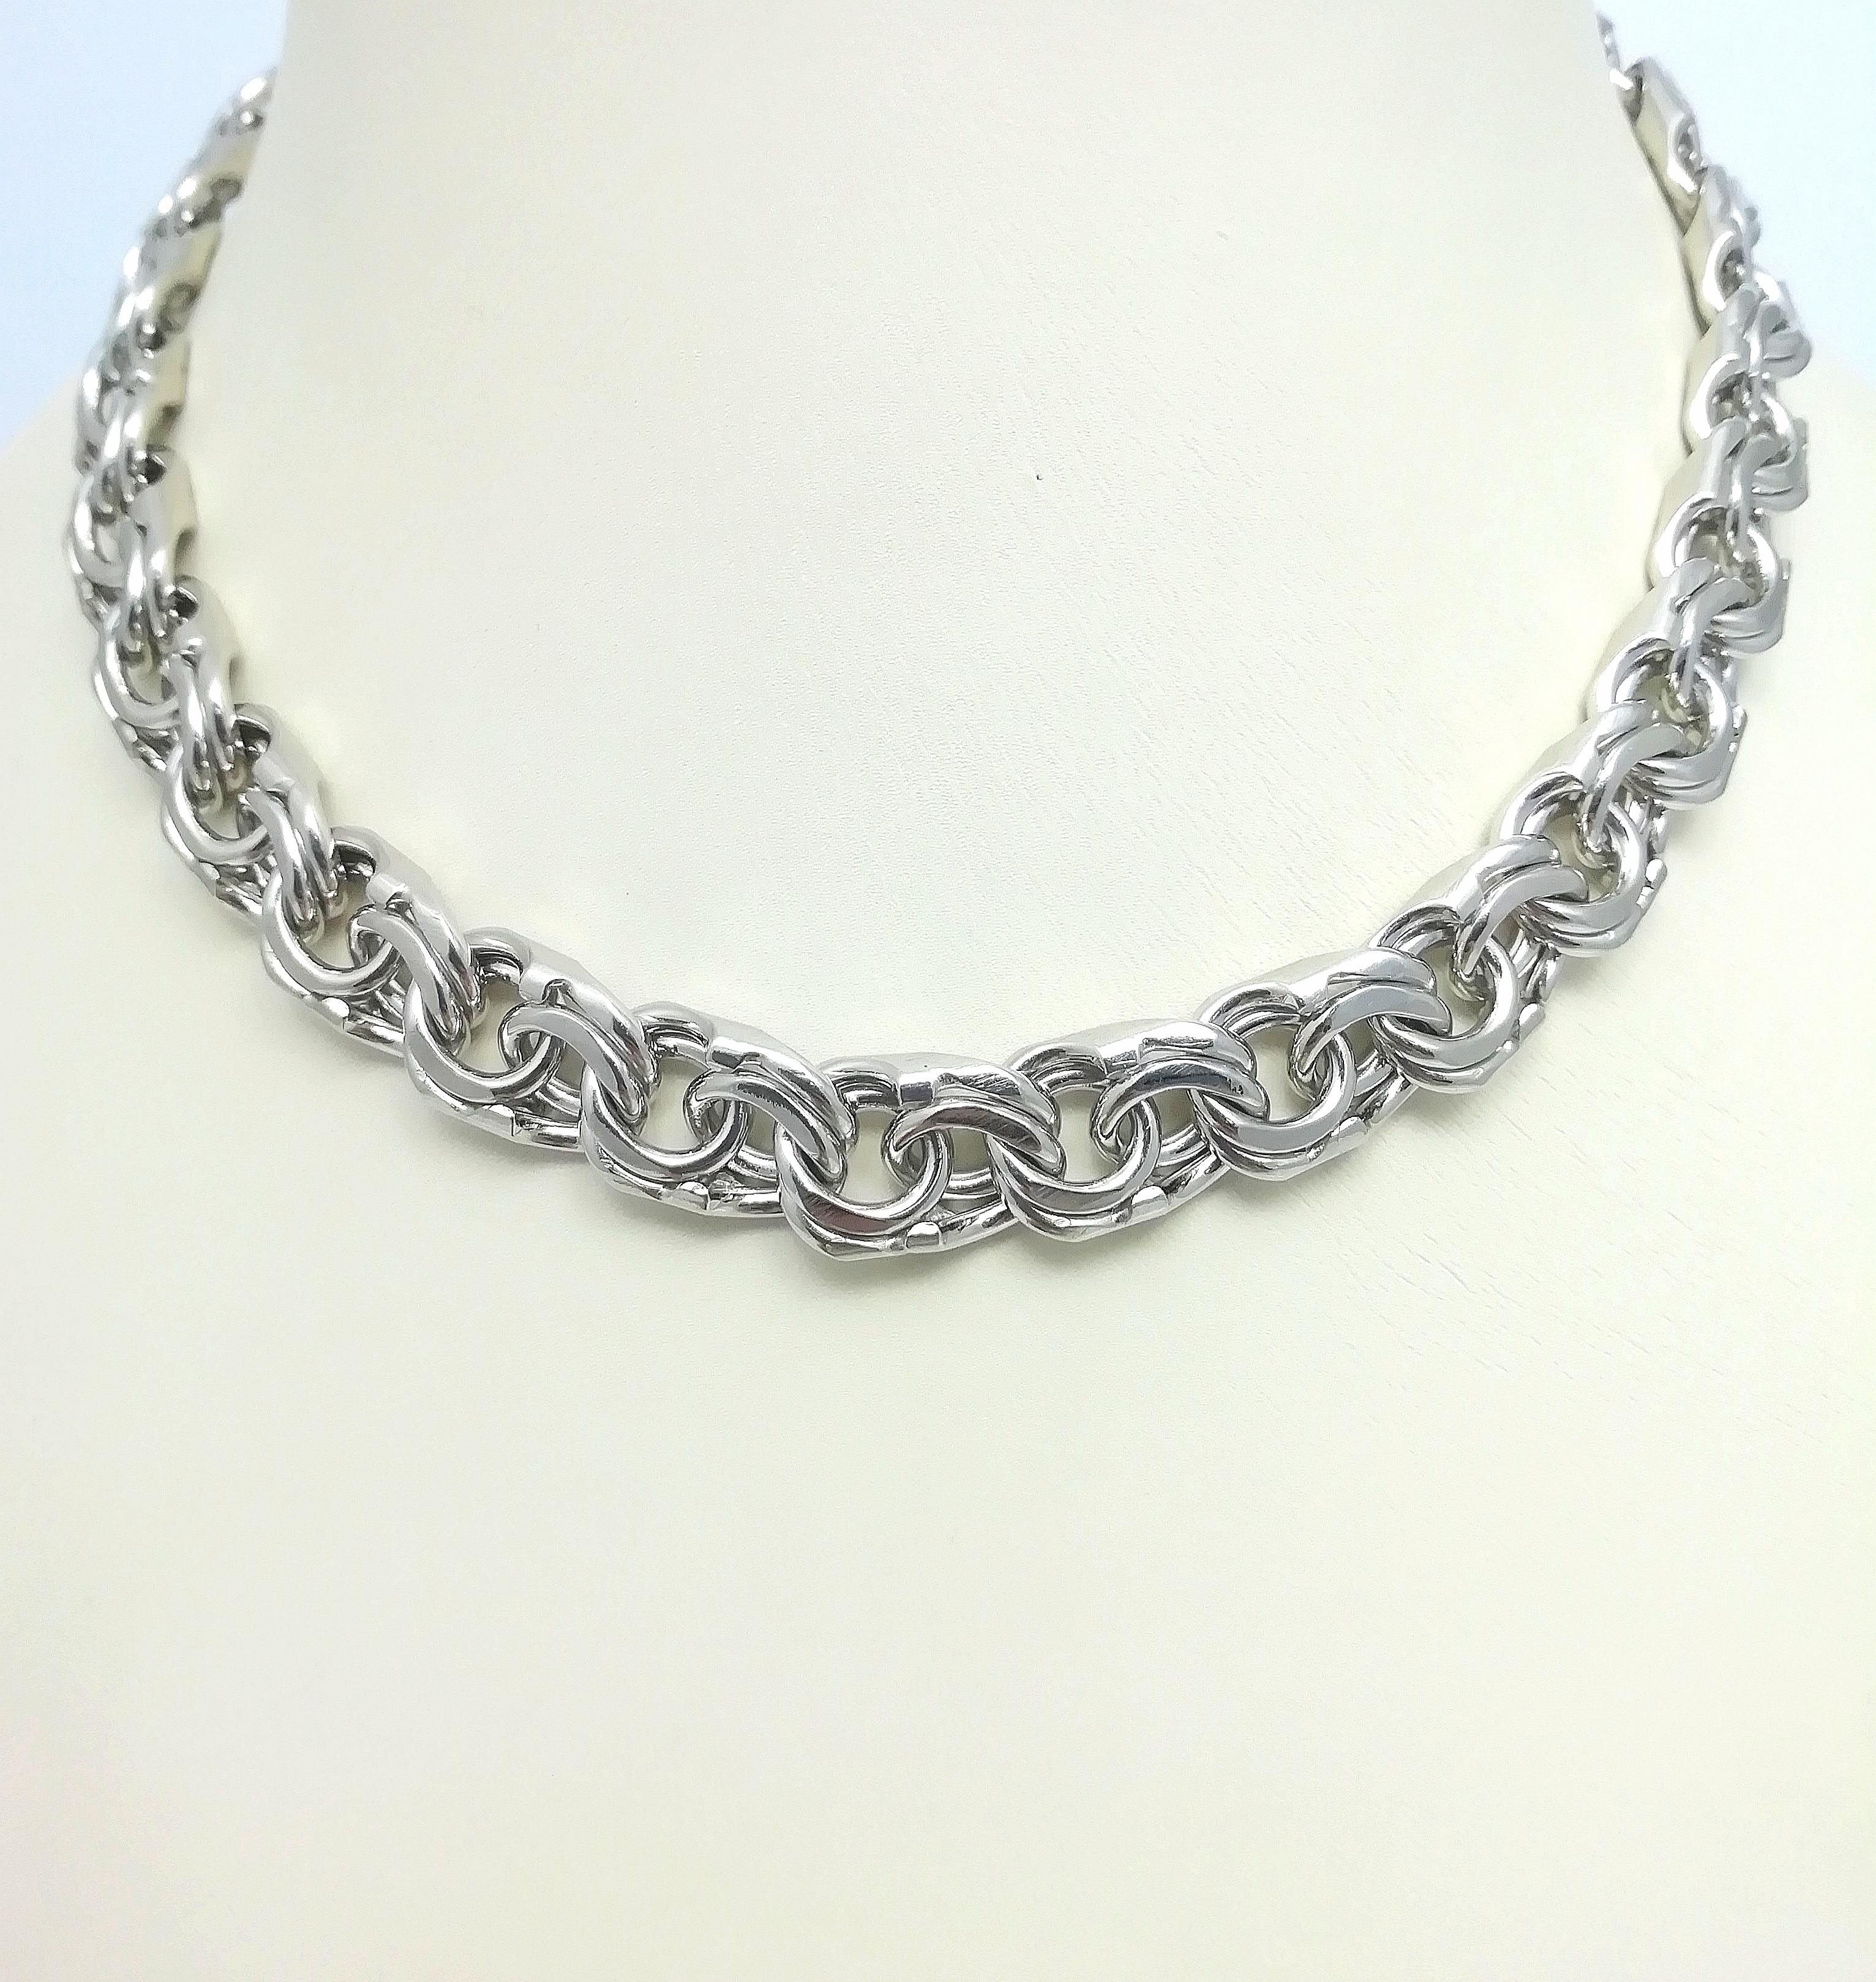 Серебро цепь дк240920-174 134,10гр